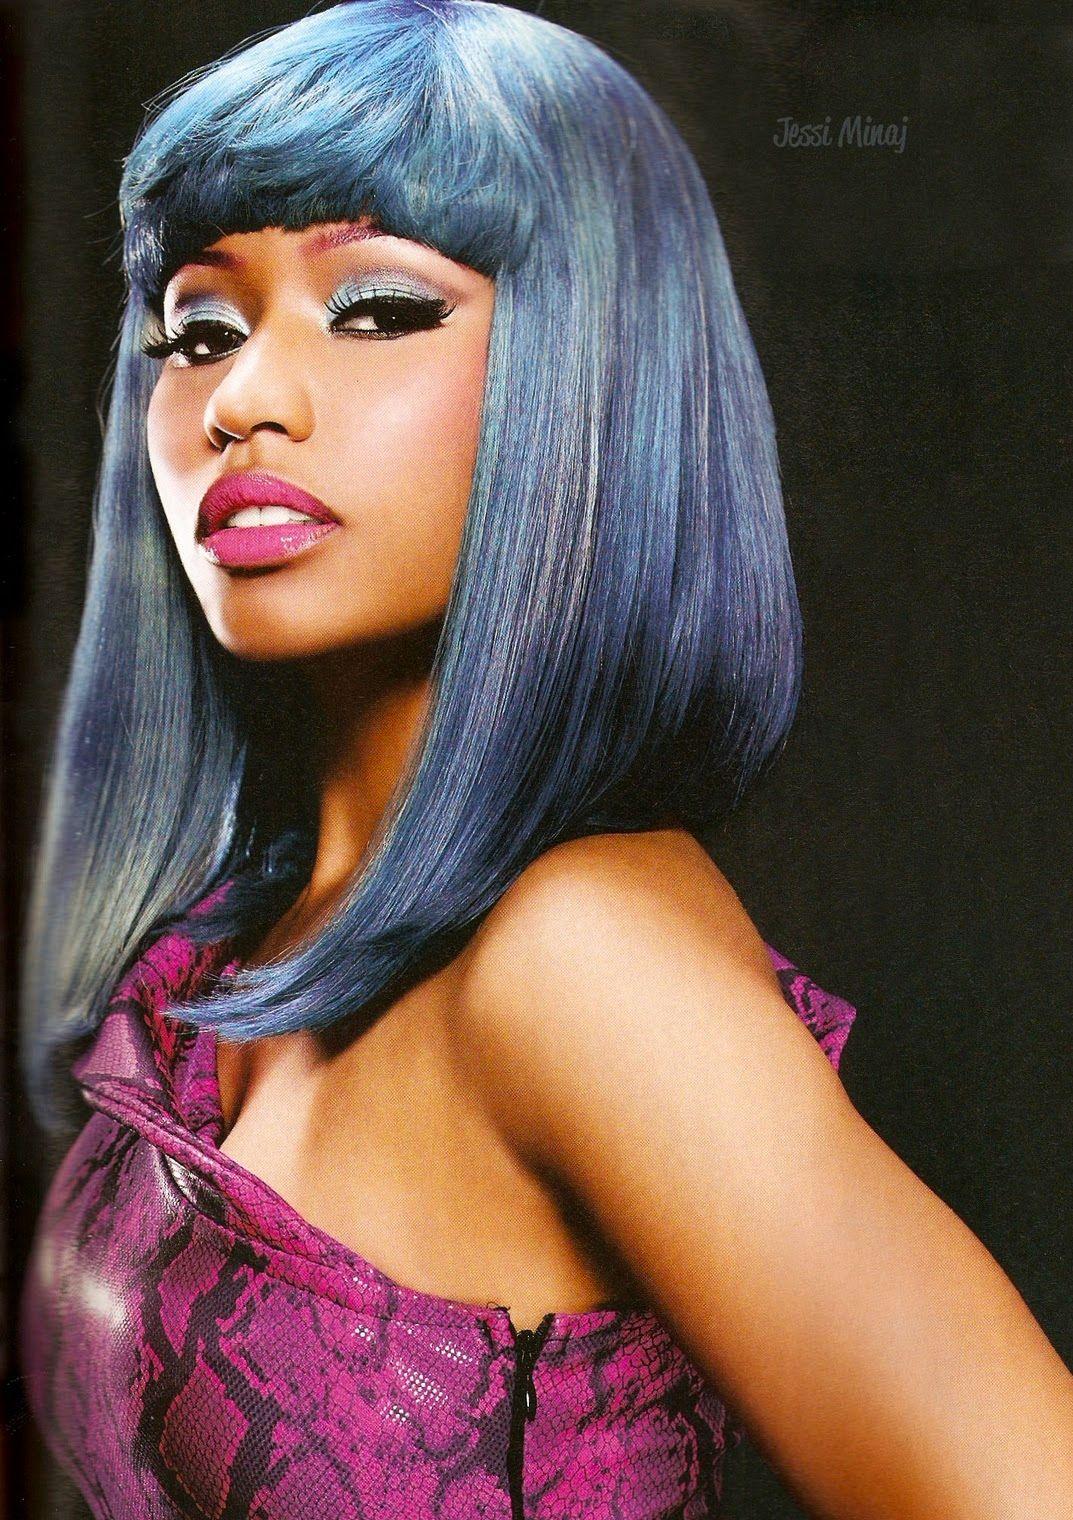 d77f9d95eb93c Nicki Minaj Reveals her Natural Hair on Twitter